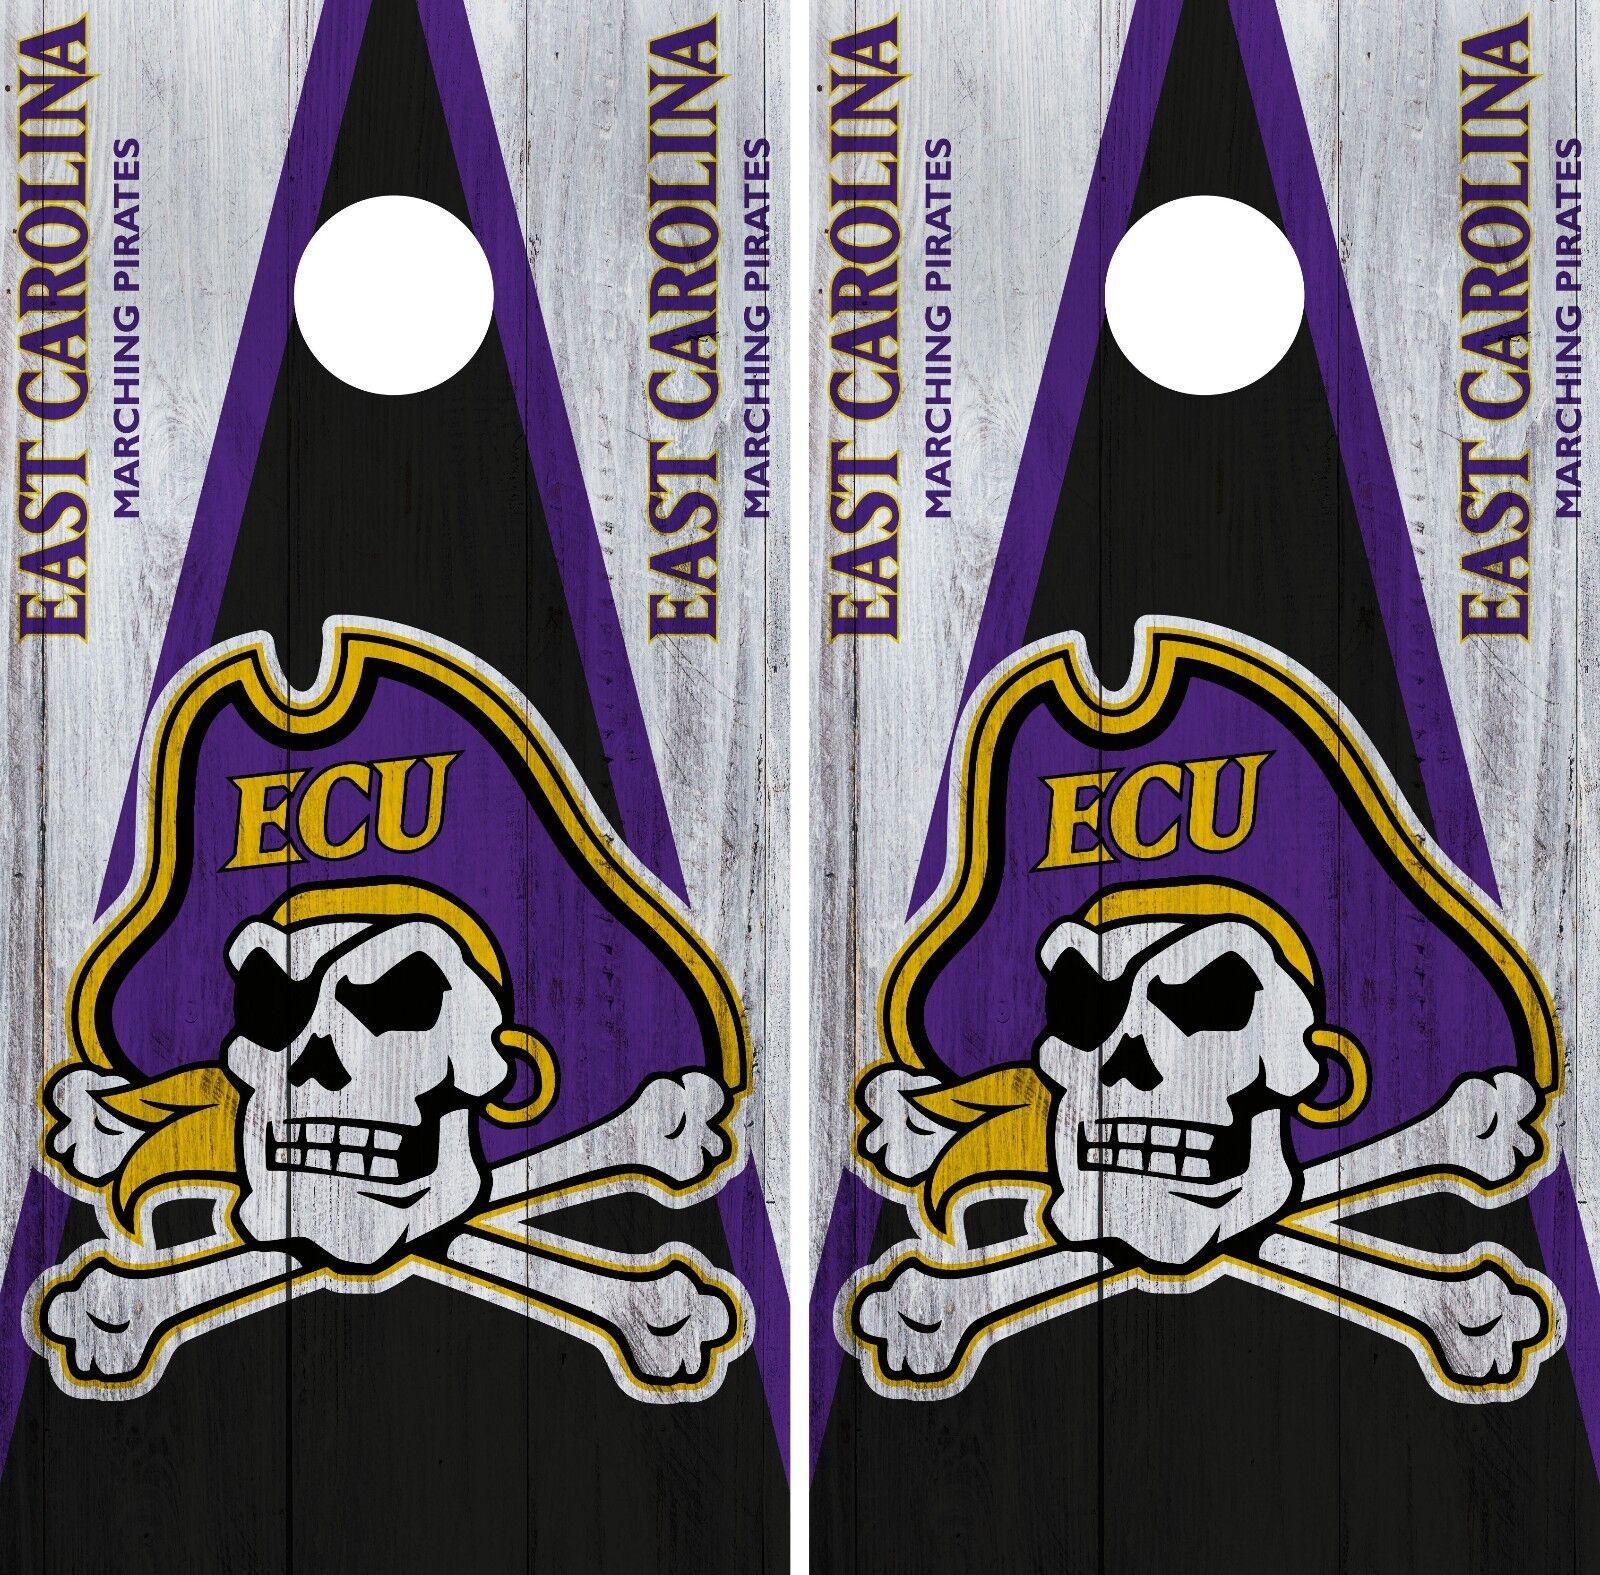 East Carolina  Pirates Cornhole Wrap NCAA Game Board Skin Vinyl Decal Set CO765  fitness retailer